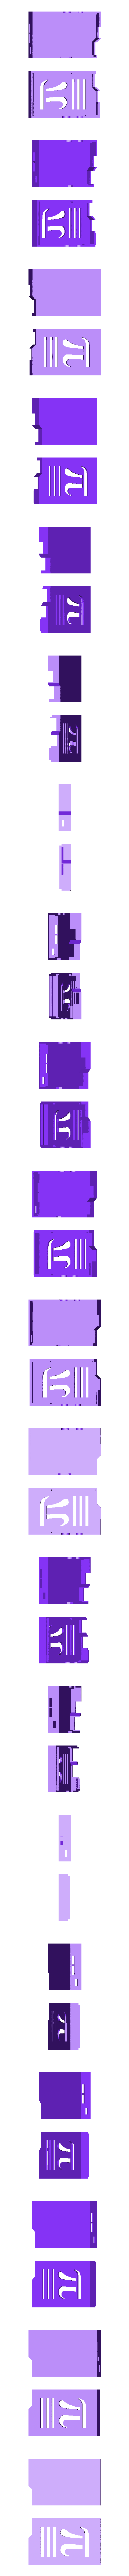 raspicase_top_bottom.stl Download free STL file Raspberry Pi Case - Pi Symbol • Object to 3D print, Lassaalk